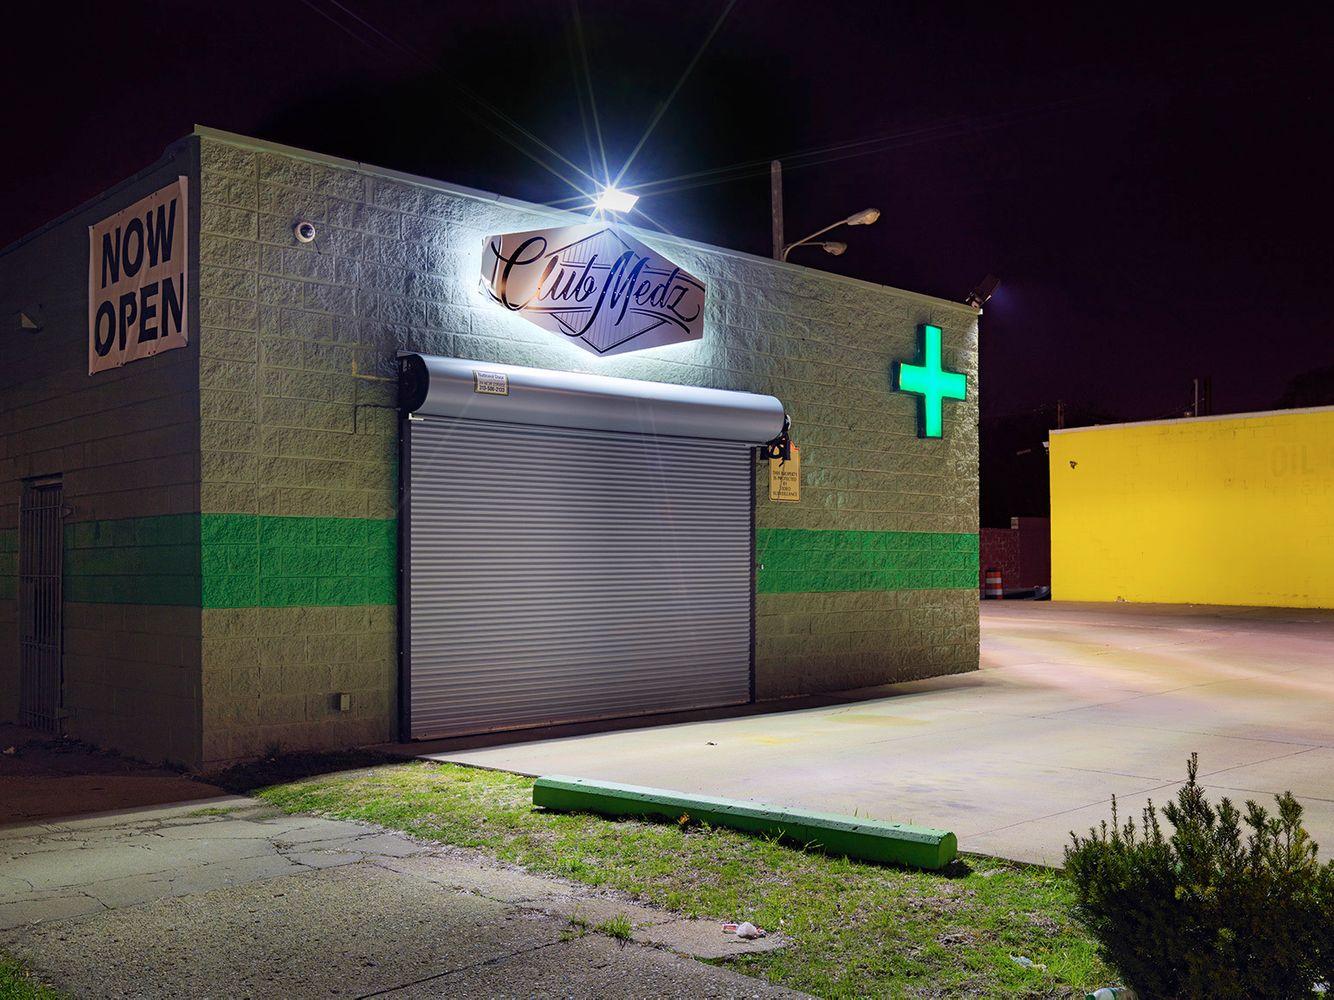 Medical Marijuana Dispensary #61, Westside, Detroit 2016